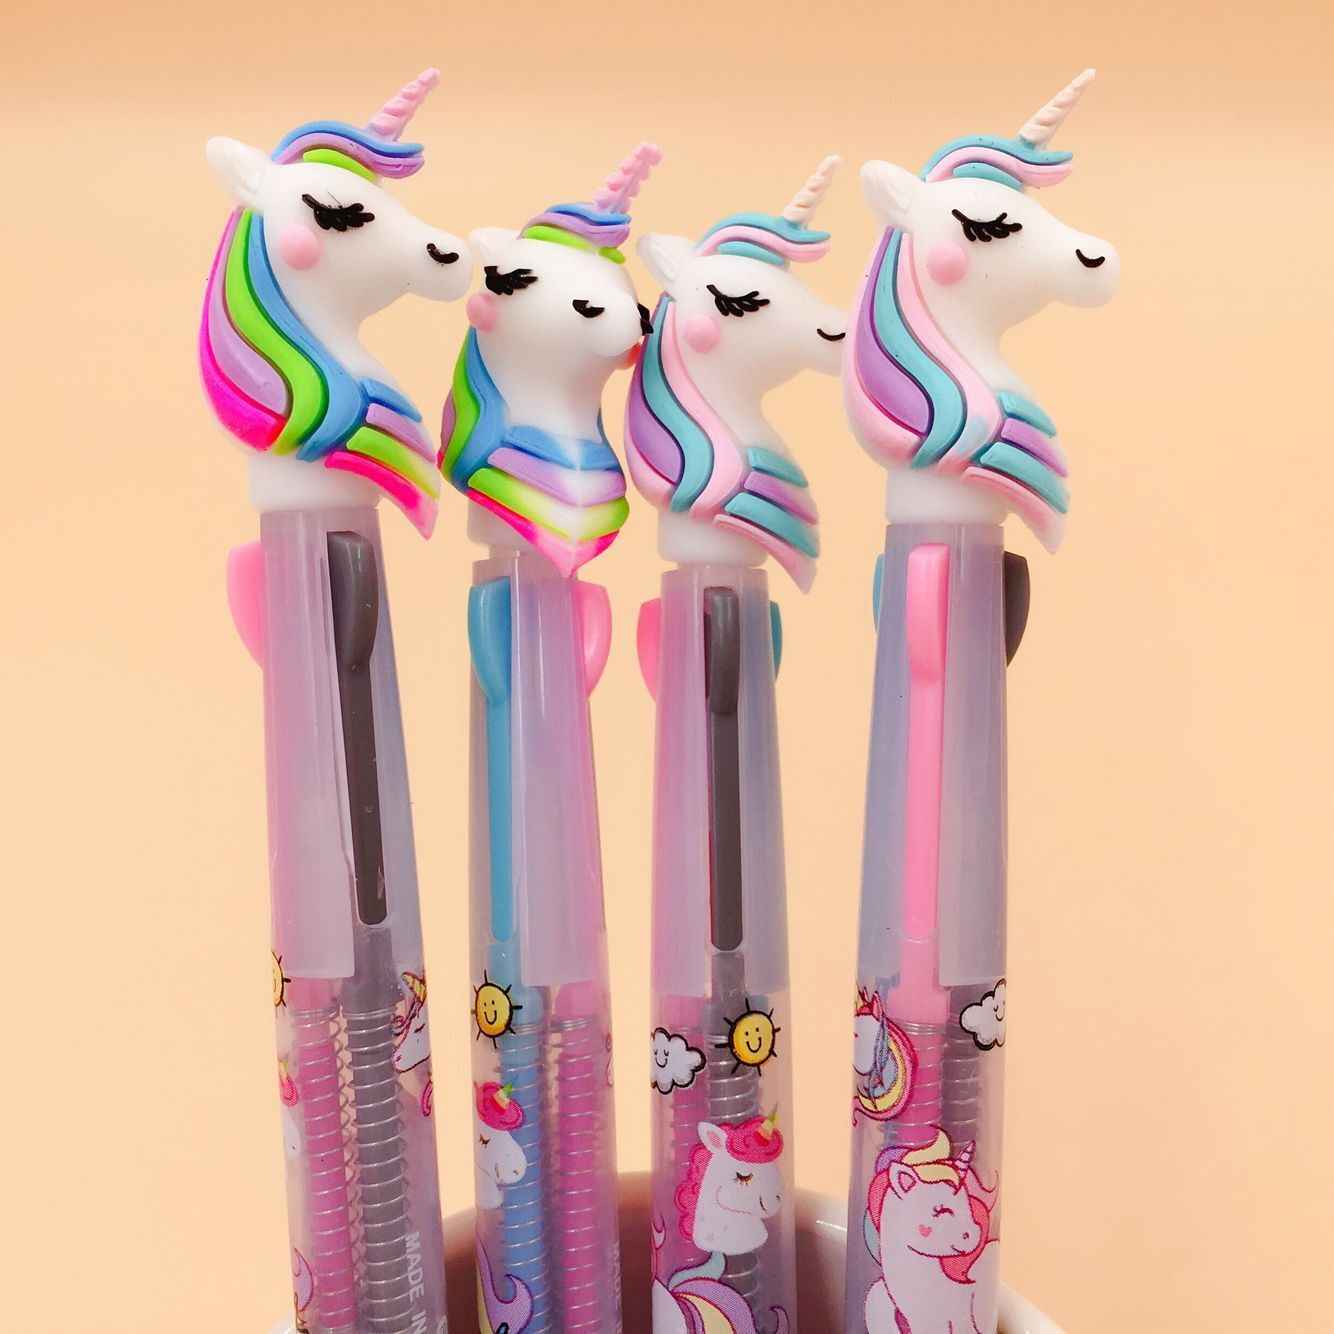 48 pcs lot Unicorn Cartoon 3 Colors Chunky Ballpoint Pen School Office Supply Gift Stationery Papelaria